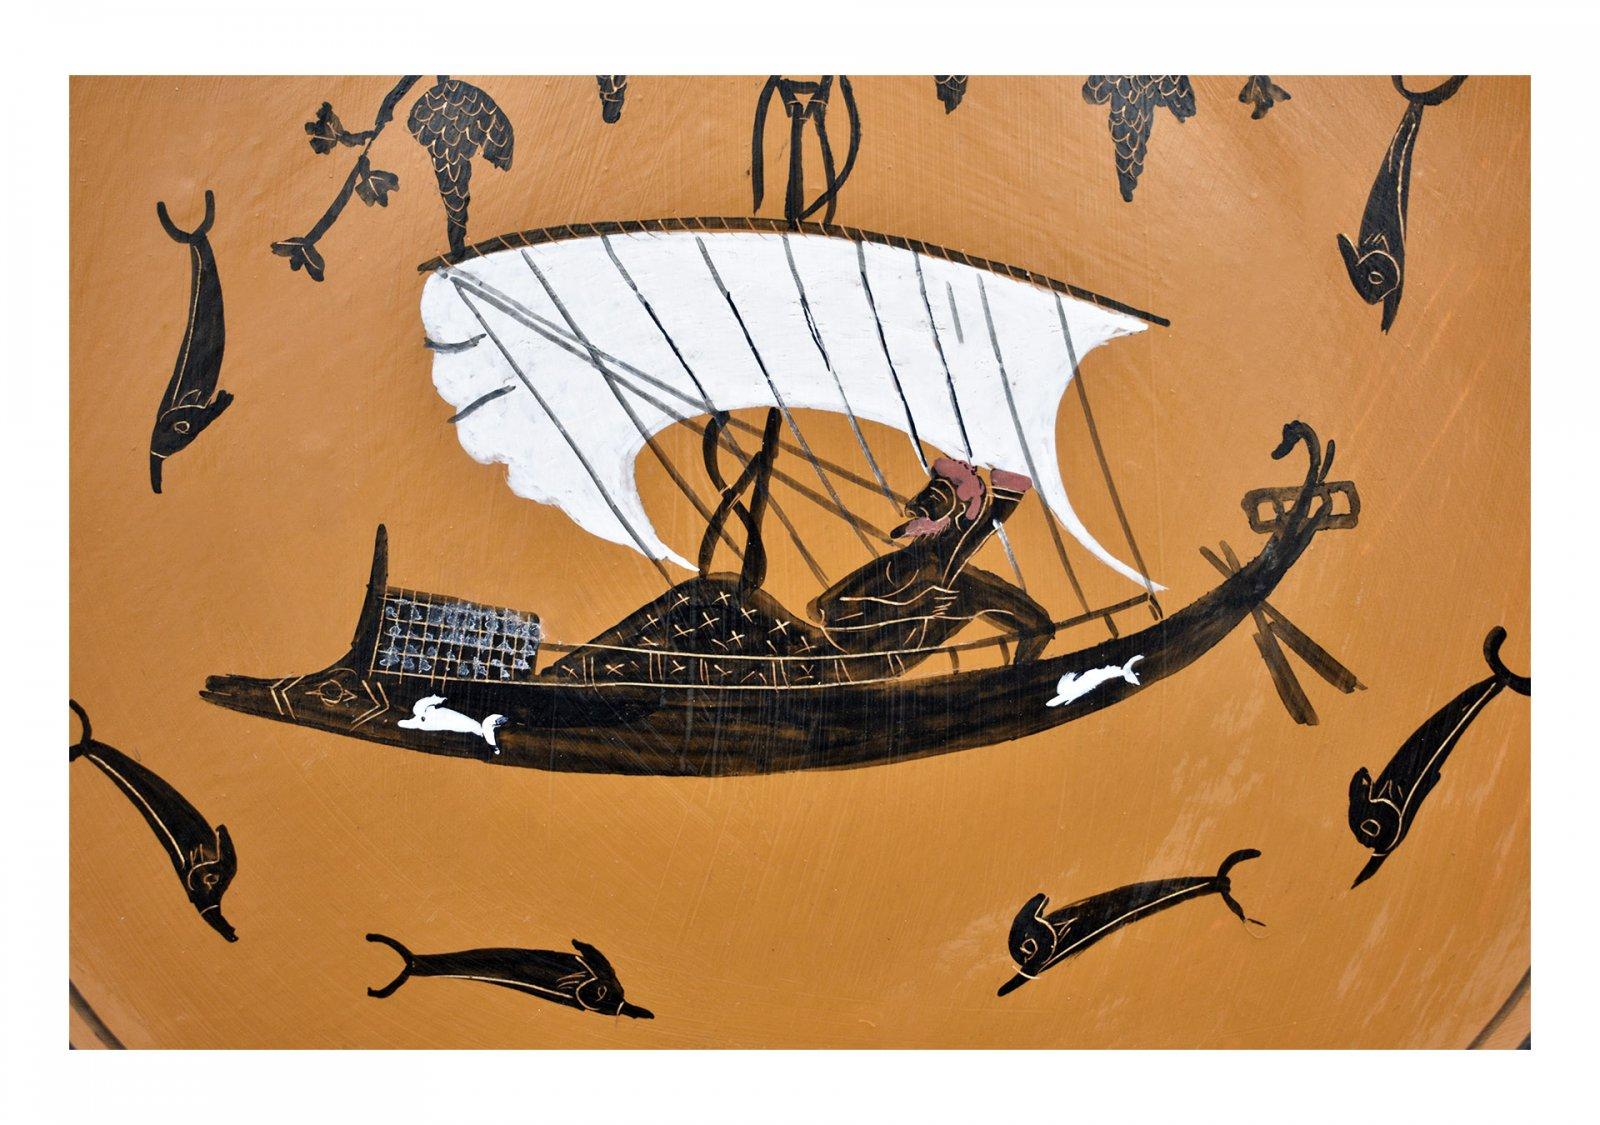 Greek Attic black-figure ceramic plate depicting God Dionysos in a ship (20cm)